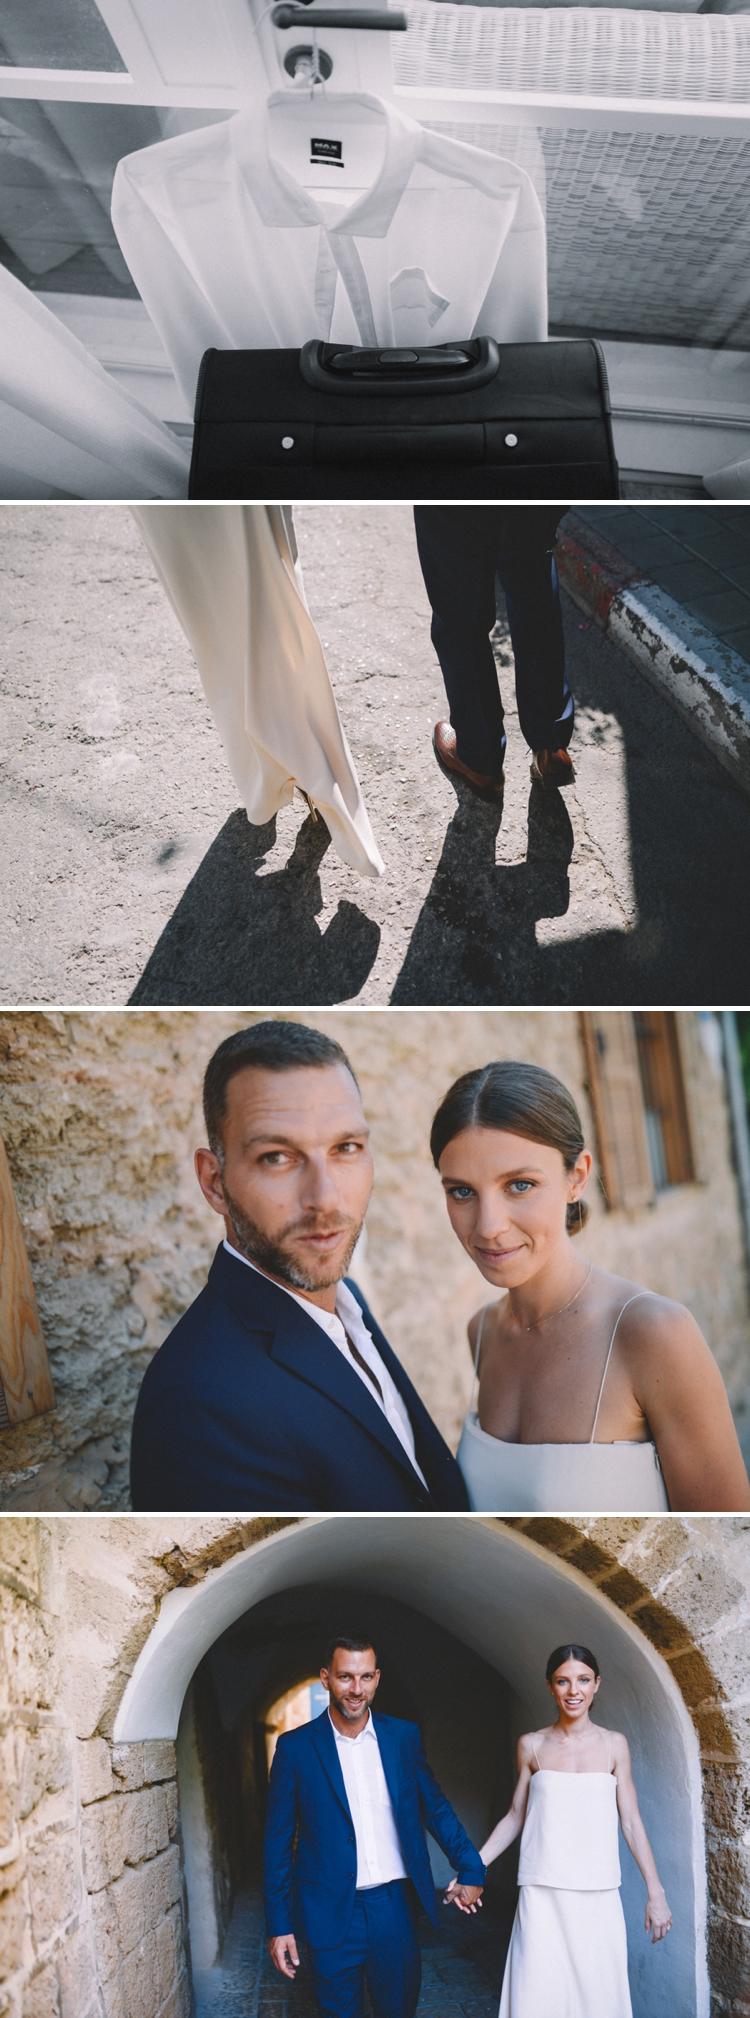 Acne groom